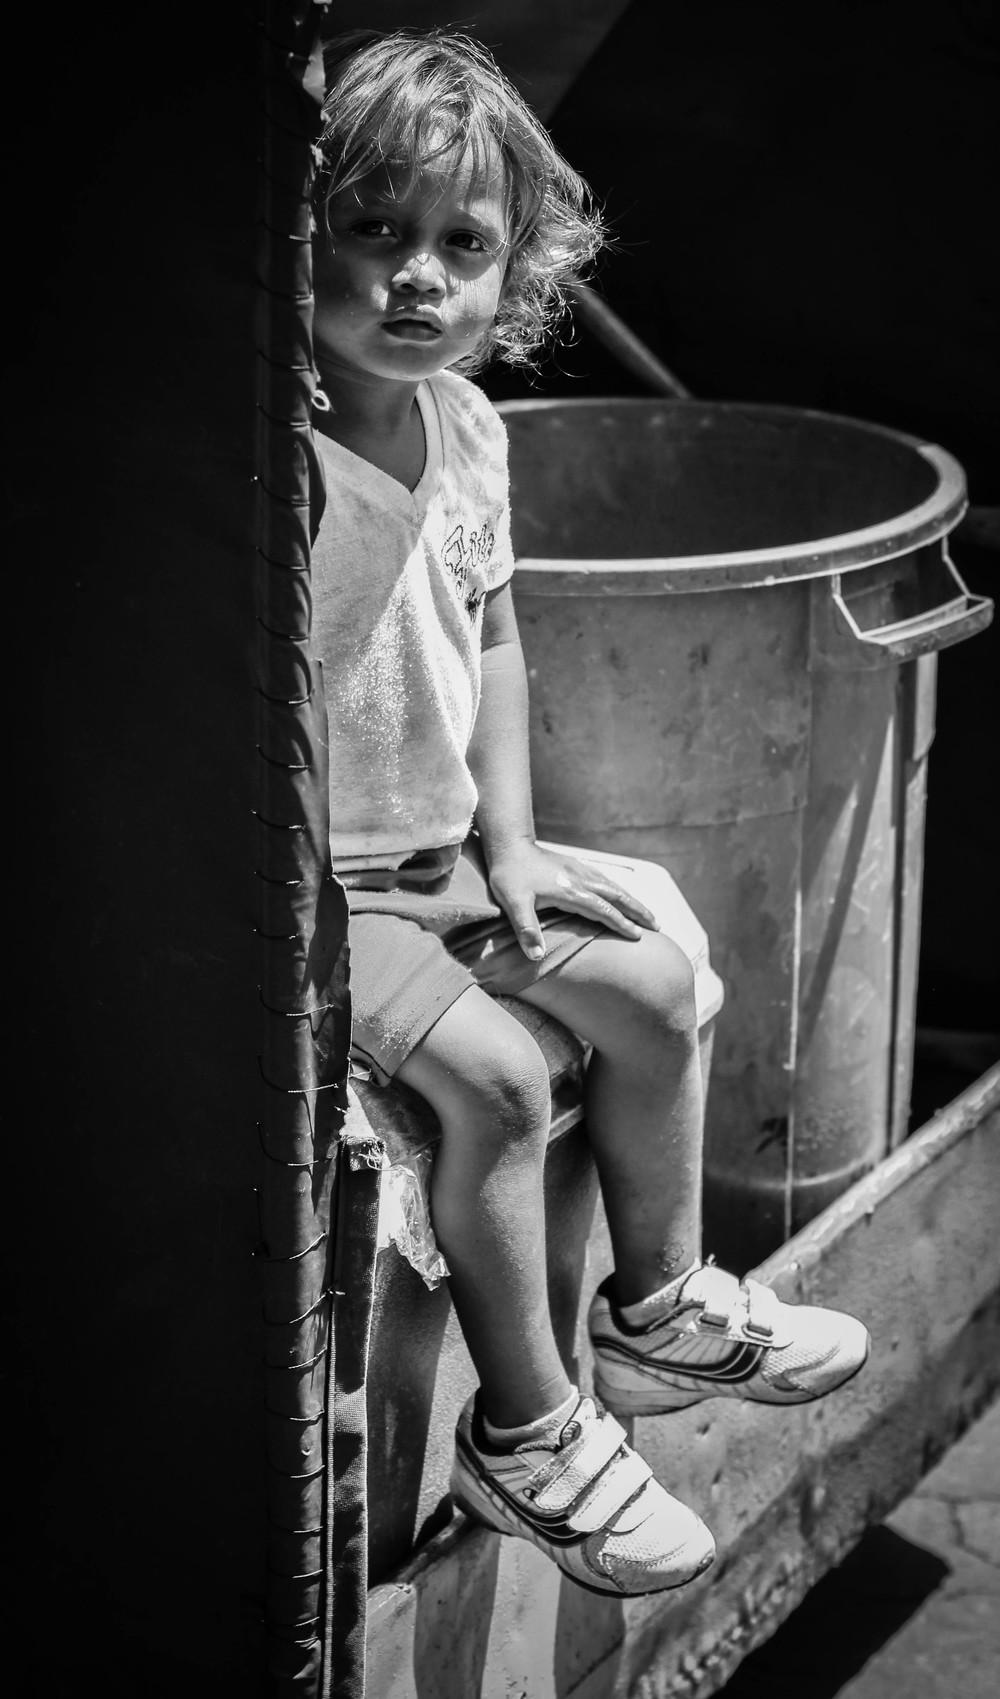 boy-cart-leon-nicaragua